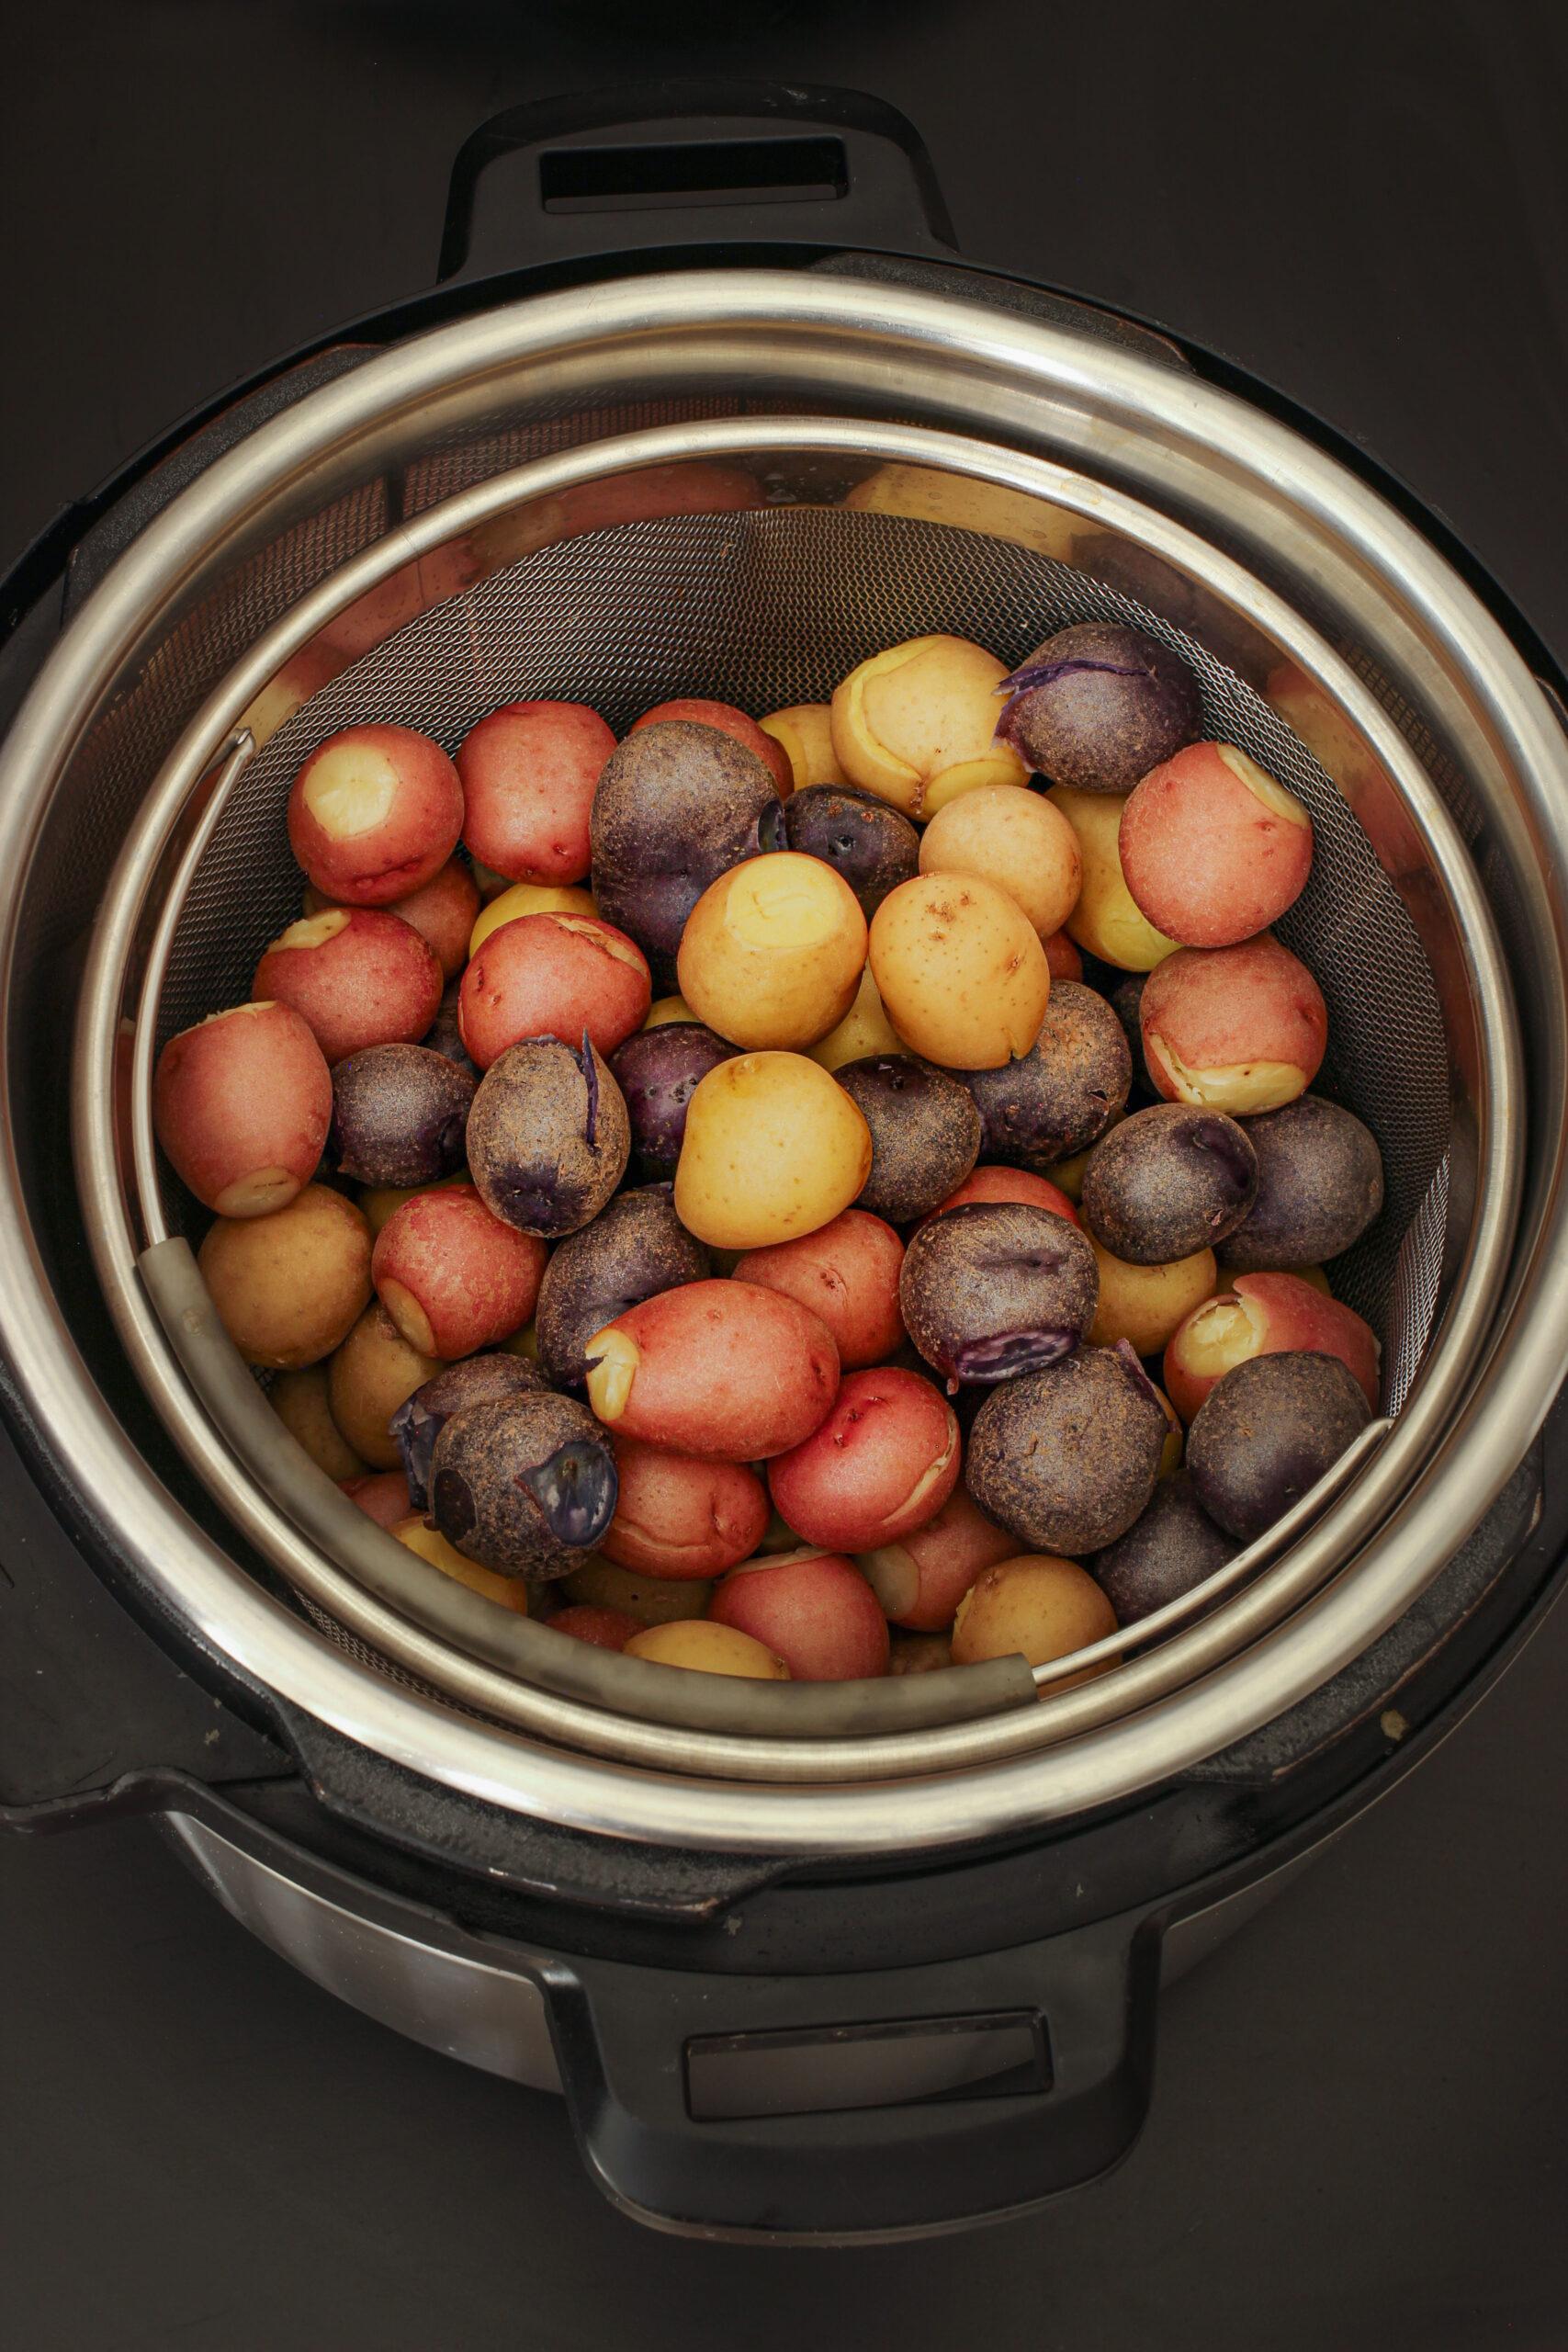 potatoes in instant pot insert.